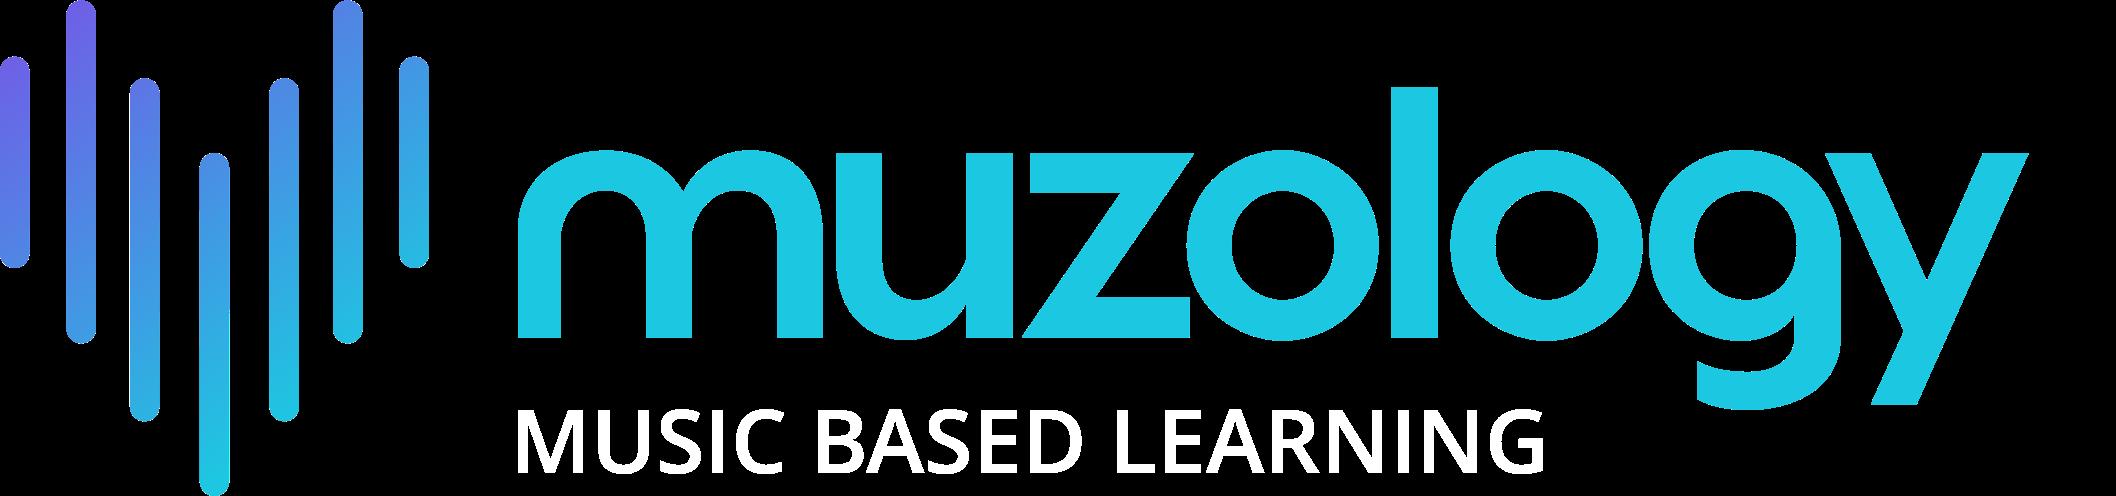 muzology-logo-v3.png